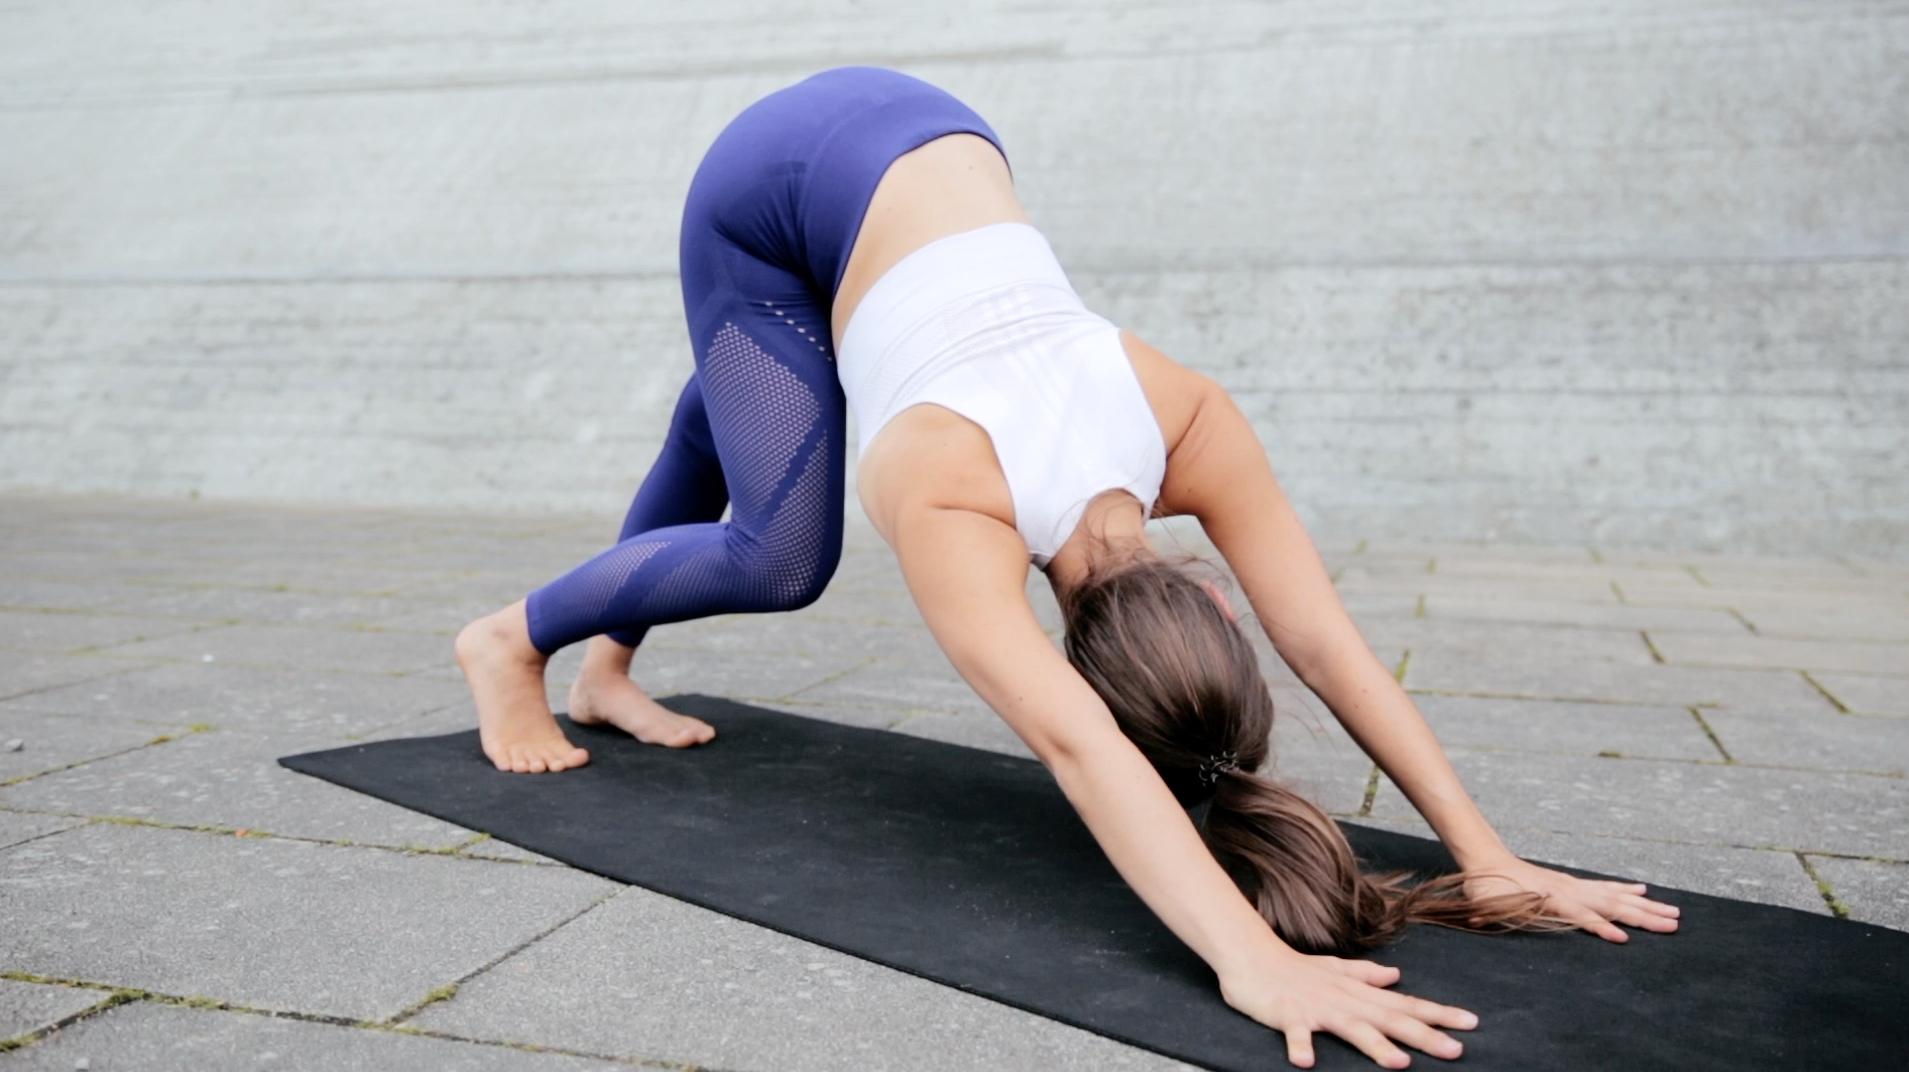 Mady-Morrison-Yoga-Detox-Flow-00008